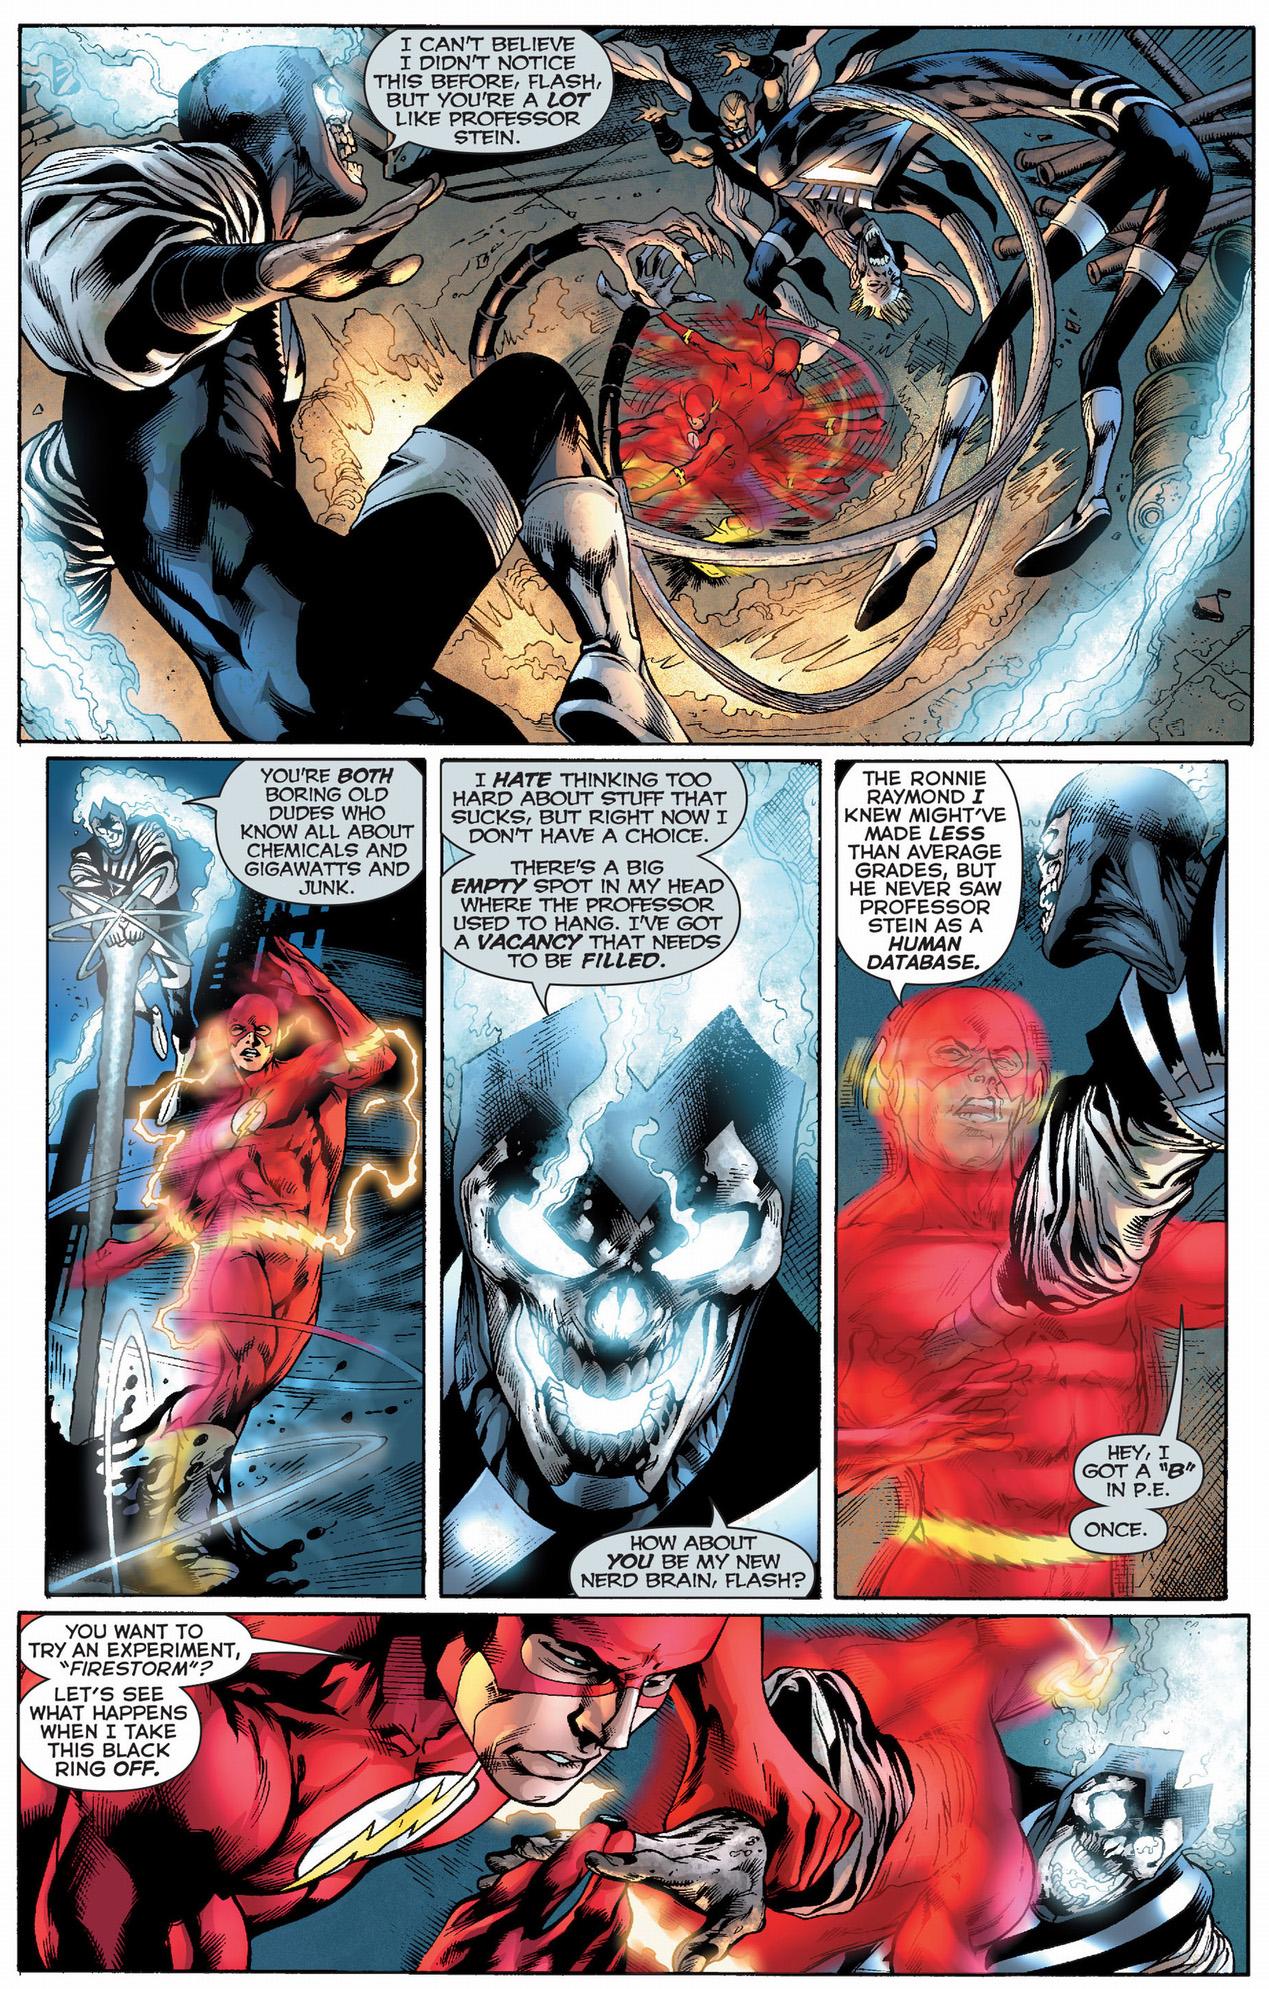 green lantern, the atom and the flash vs black lantern justice league 2